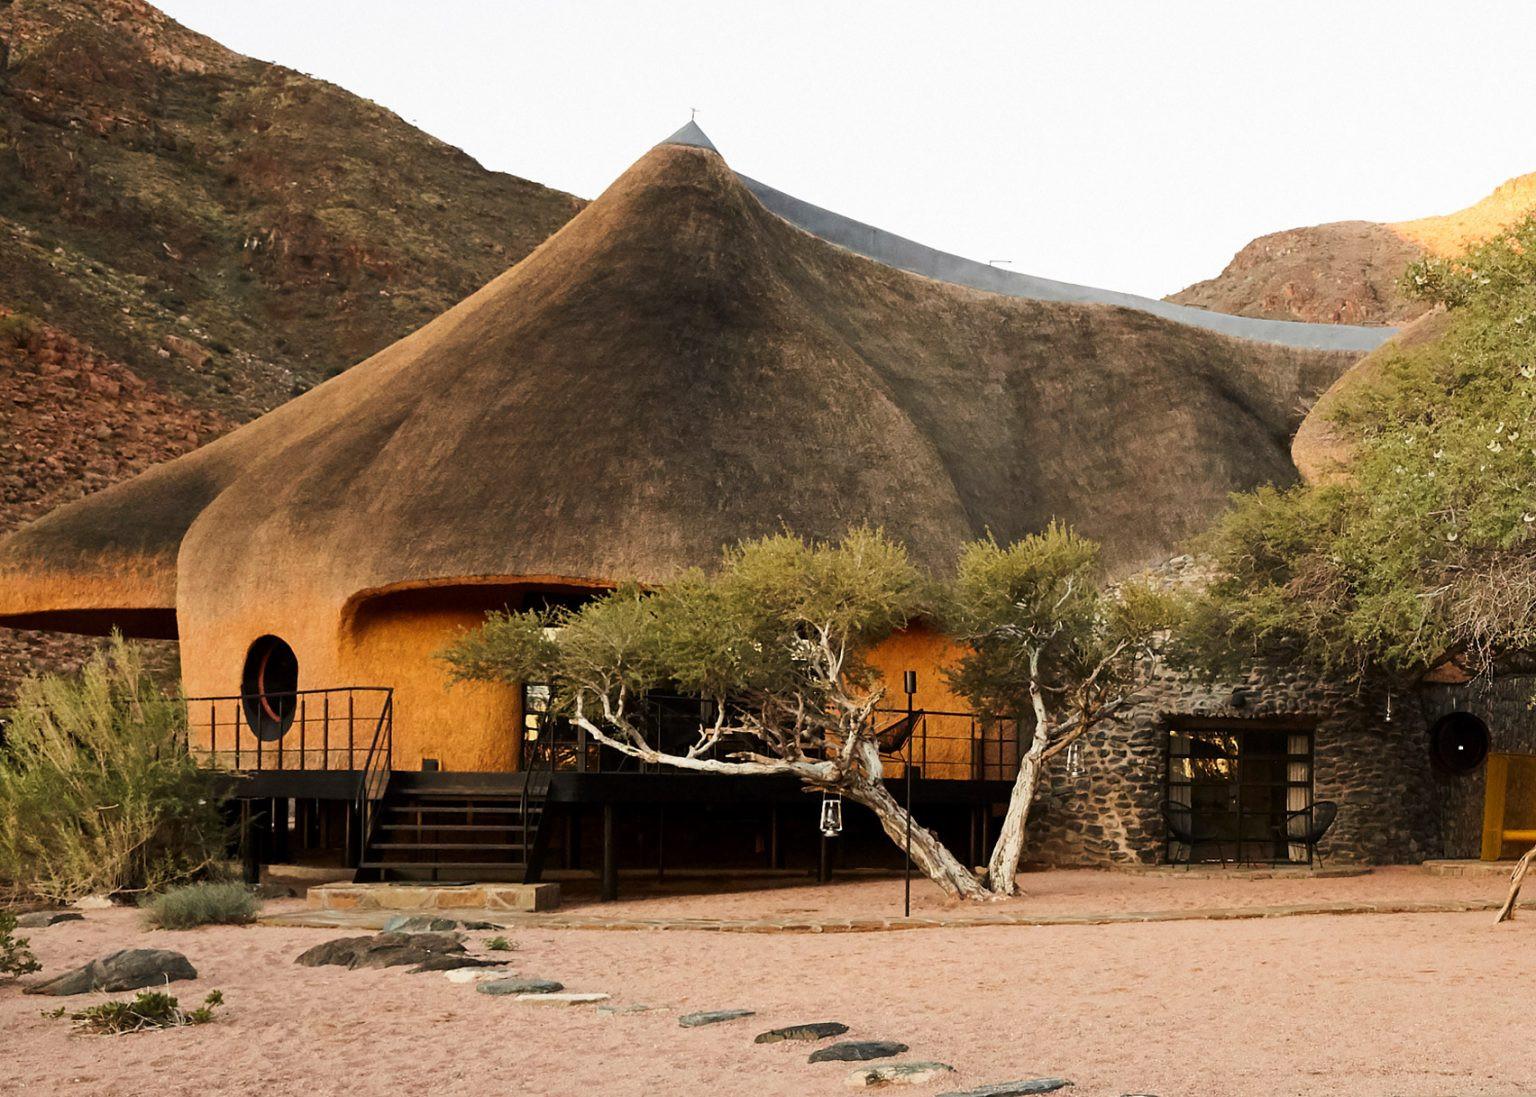 Hotels-namibia-porky-hefer-1